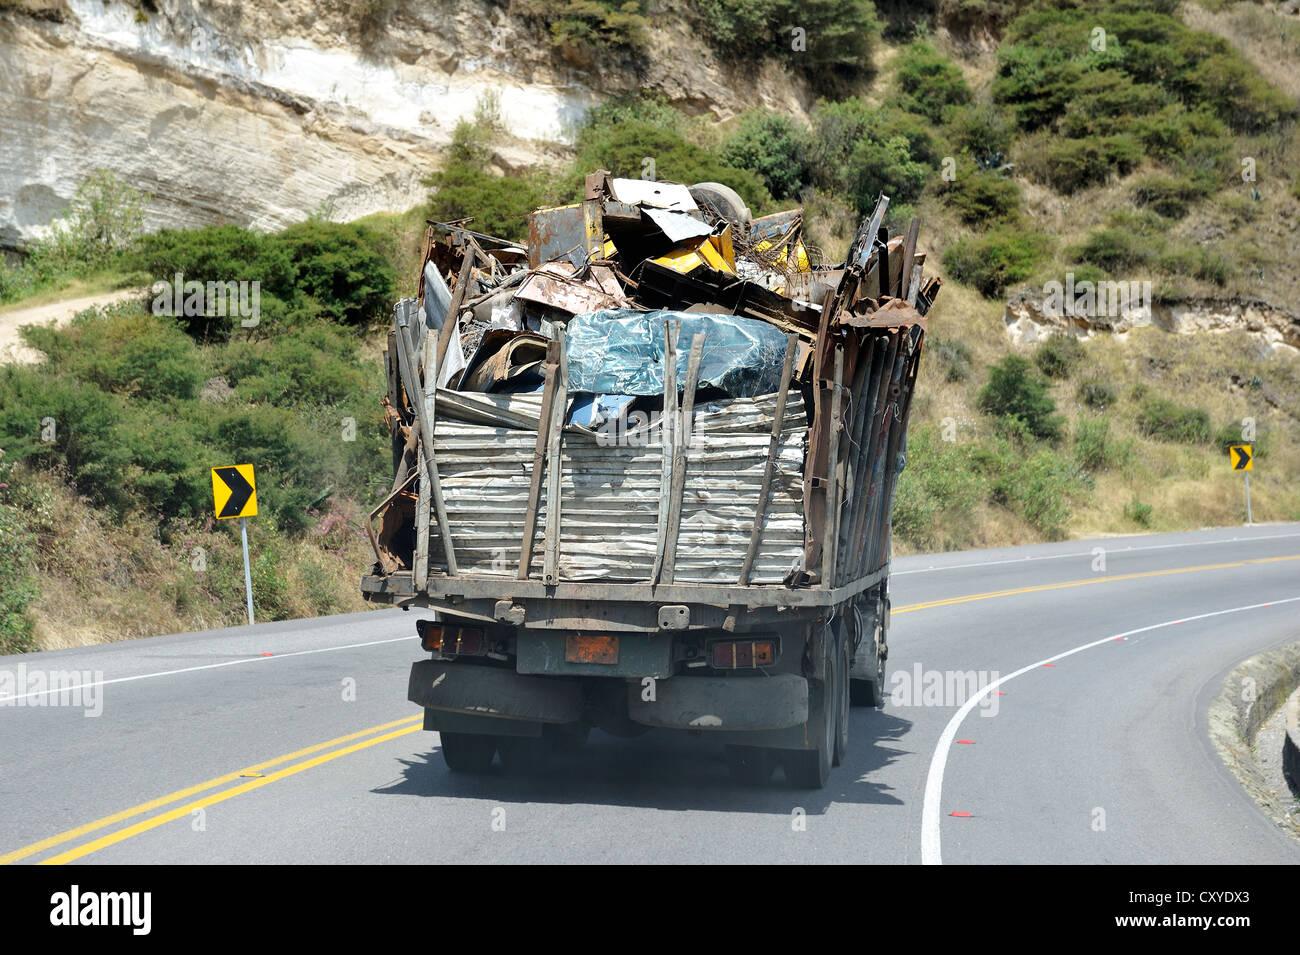 LKW-Transport von Metall, Ecuador, Südamerika Stockbild